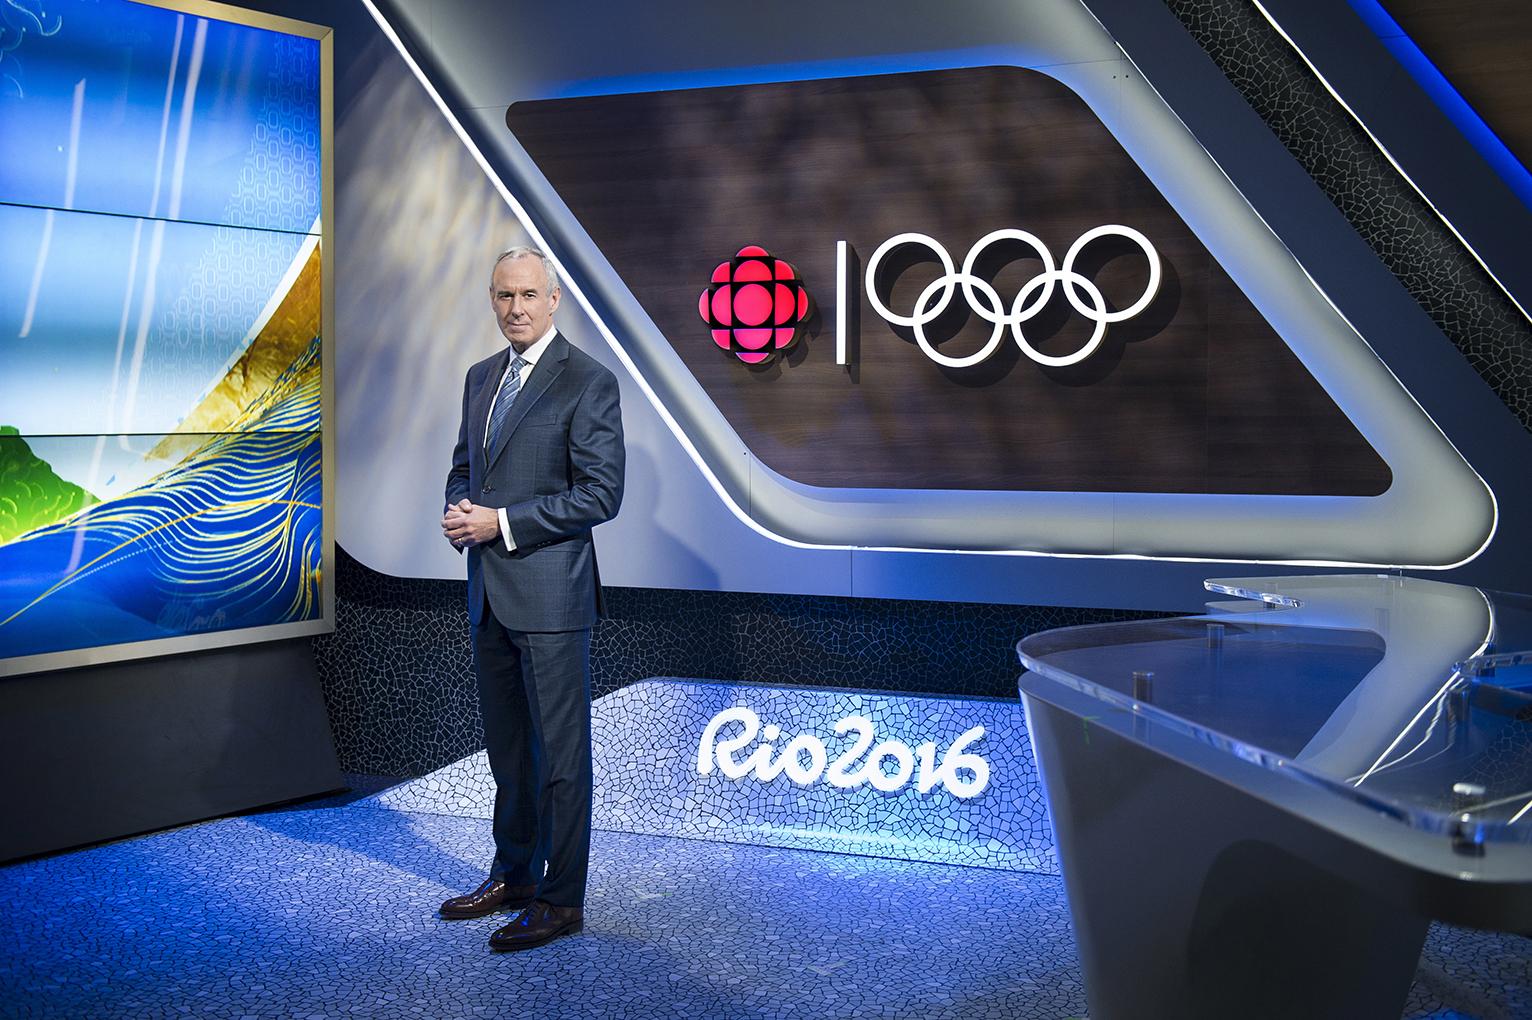 ncs_CBC-Rio-Olympics-TV-Studio_0006